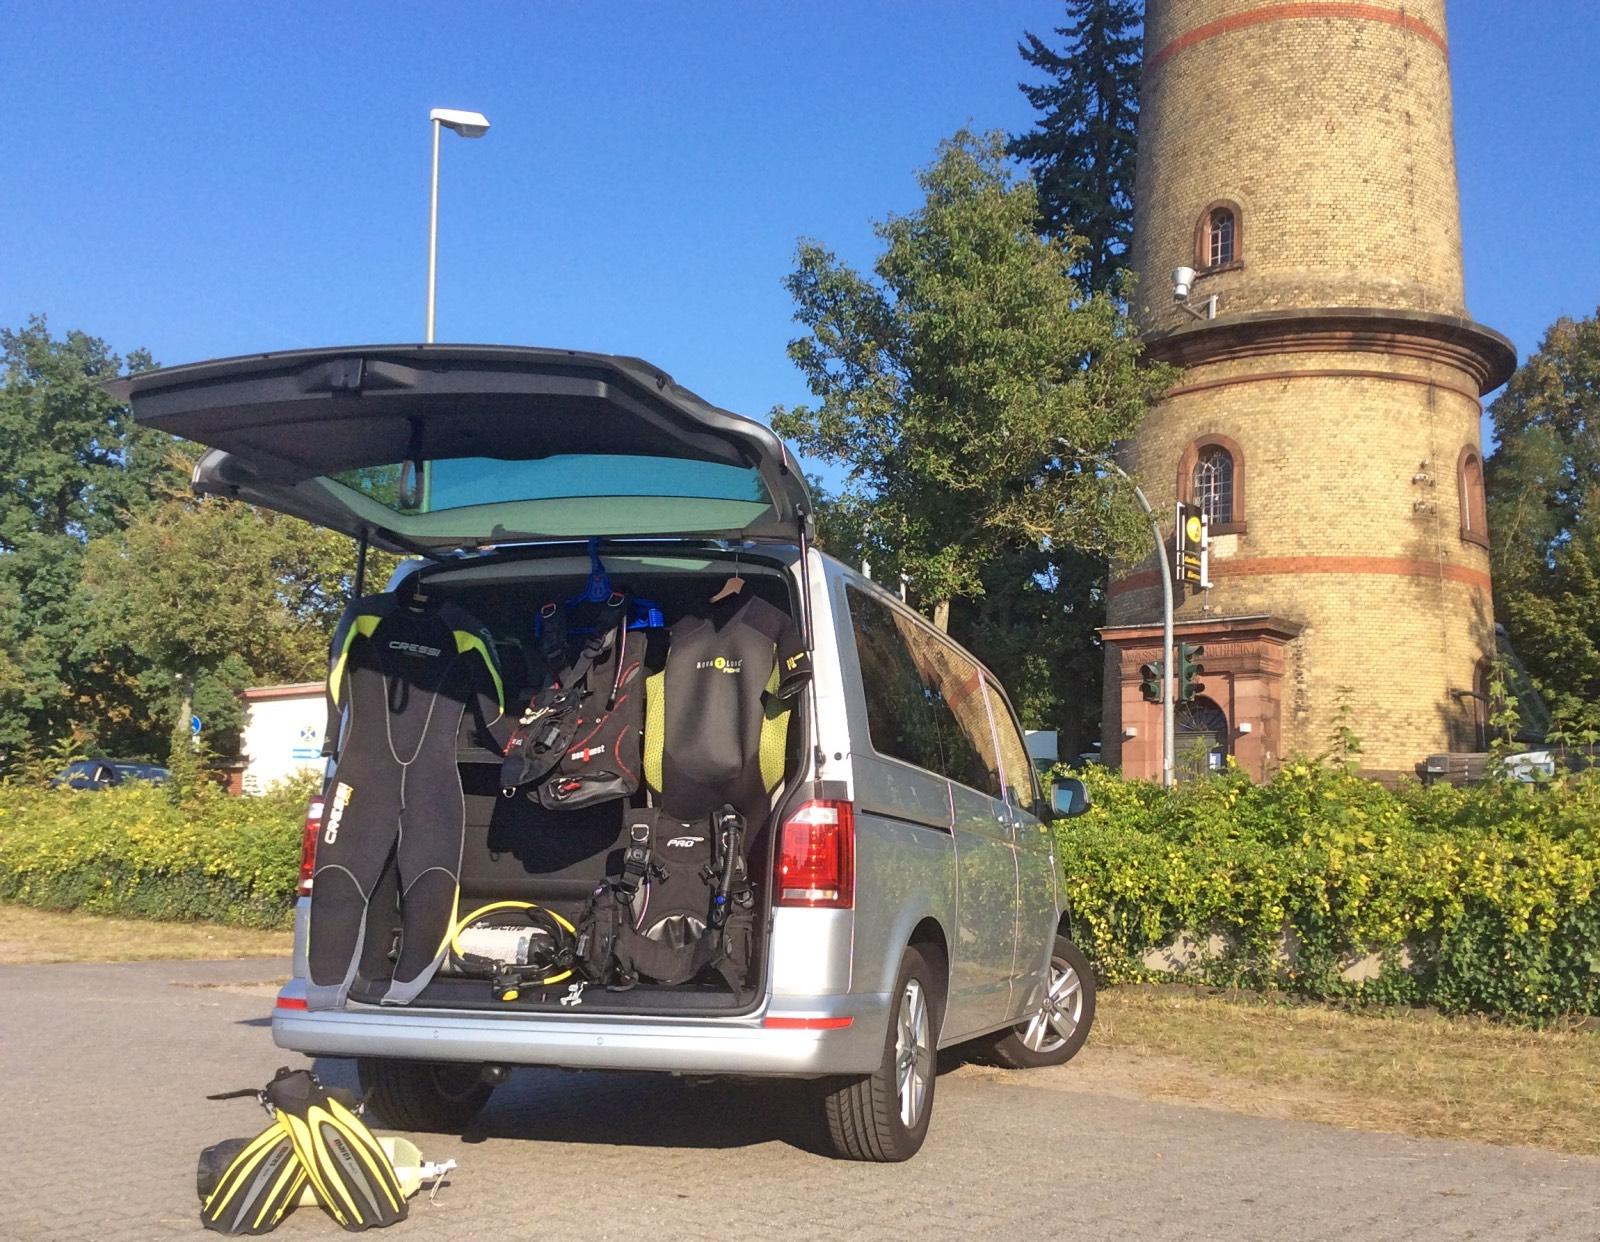 Autos, Lkw & Busse Modellbau Motiviert Vw Volkswagen T6 Multivan Personen Transporter Schwarz T5 Ab 2 Facelift 2015 ..